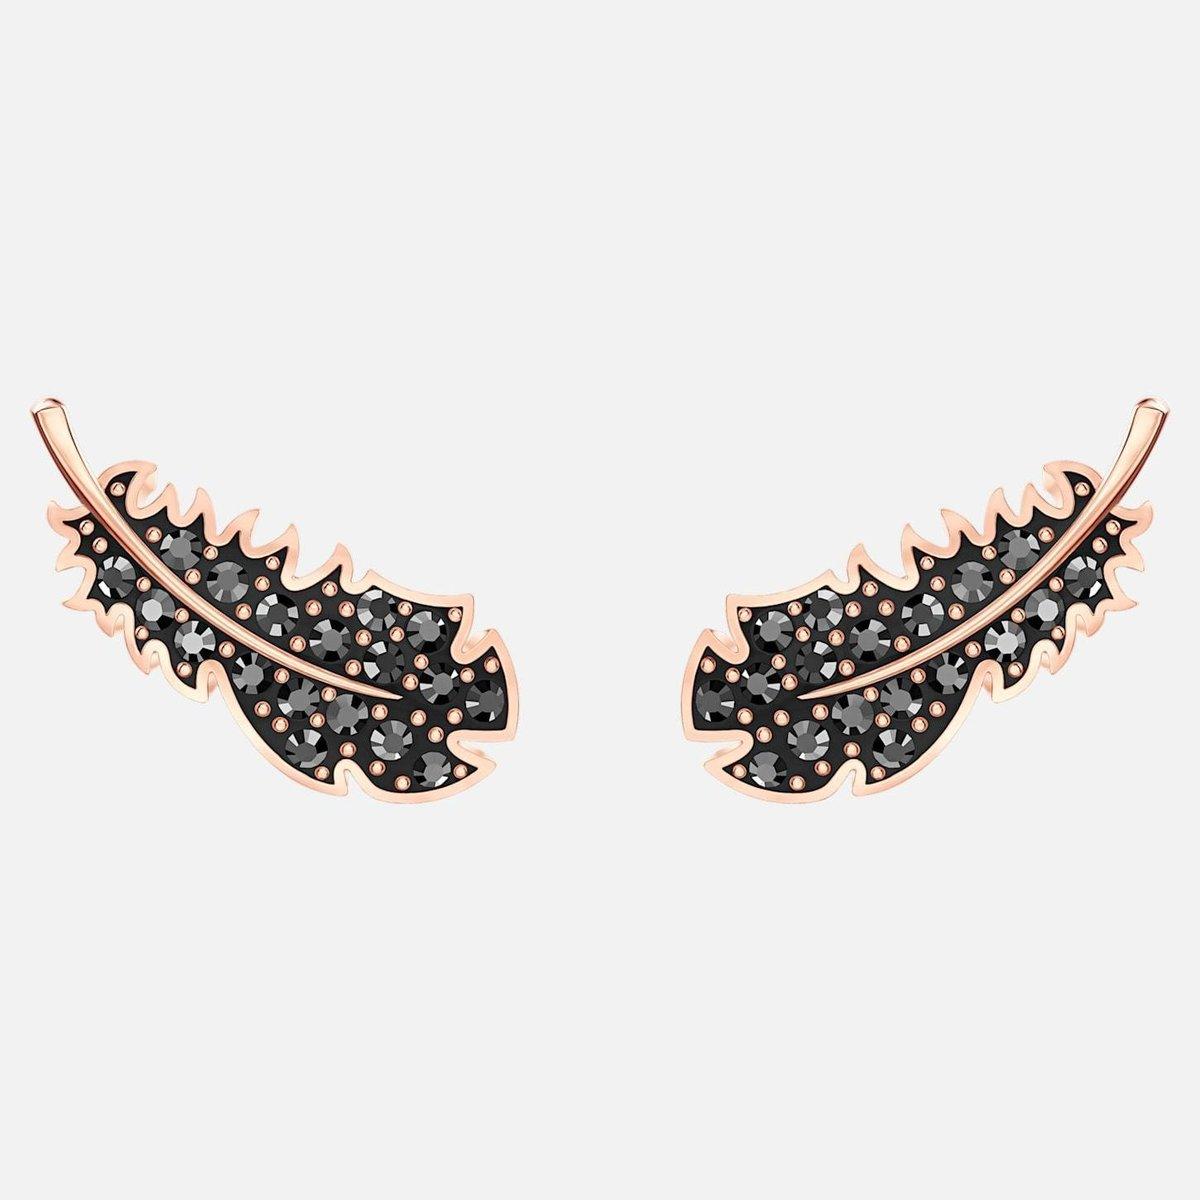 Earrings - Swarovski NAUGHTY PIERCED EARRINGS - 5509722 (Parallel Import Goods)